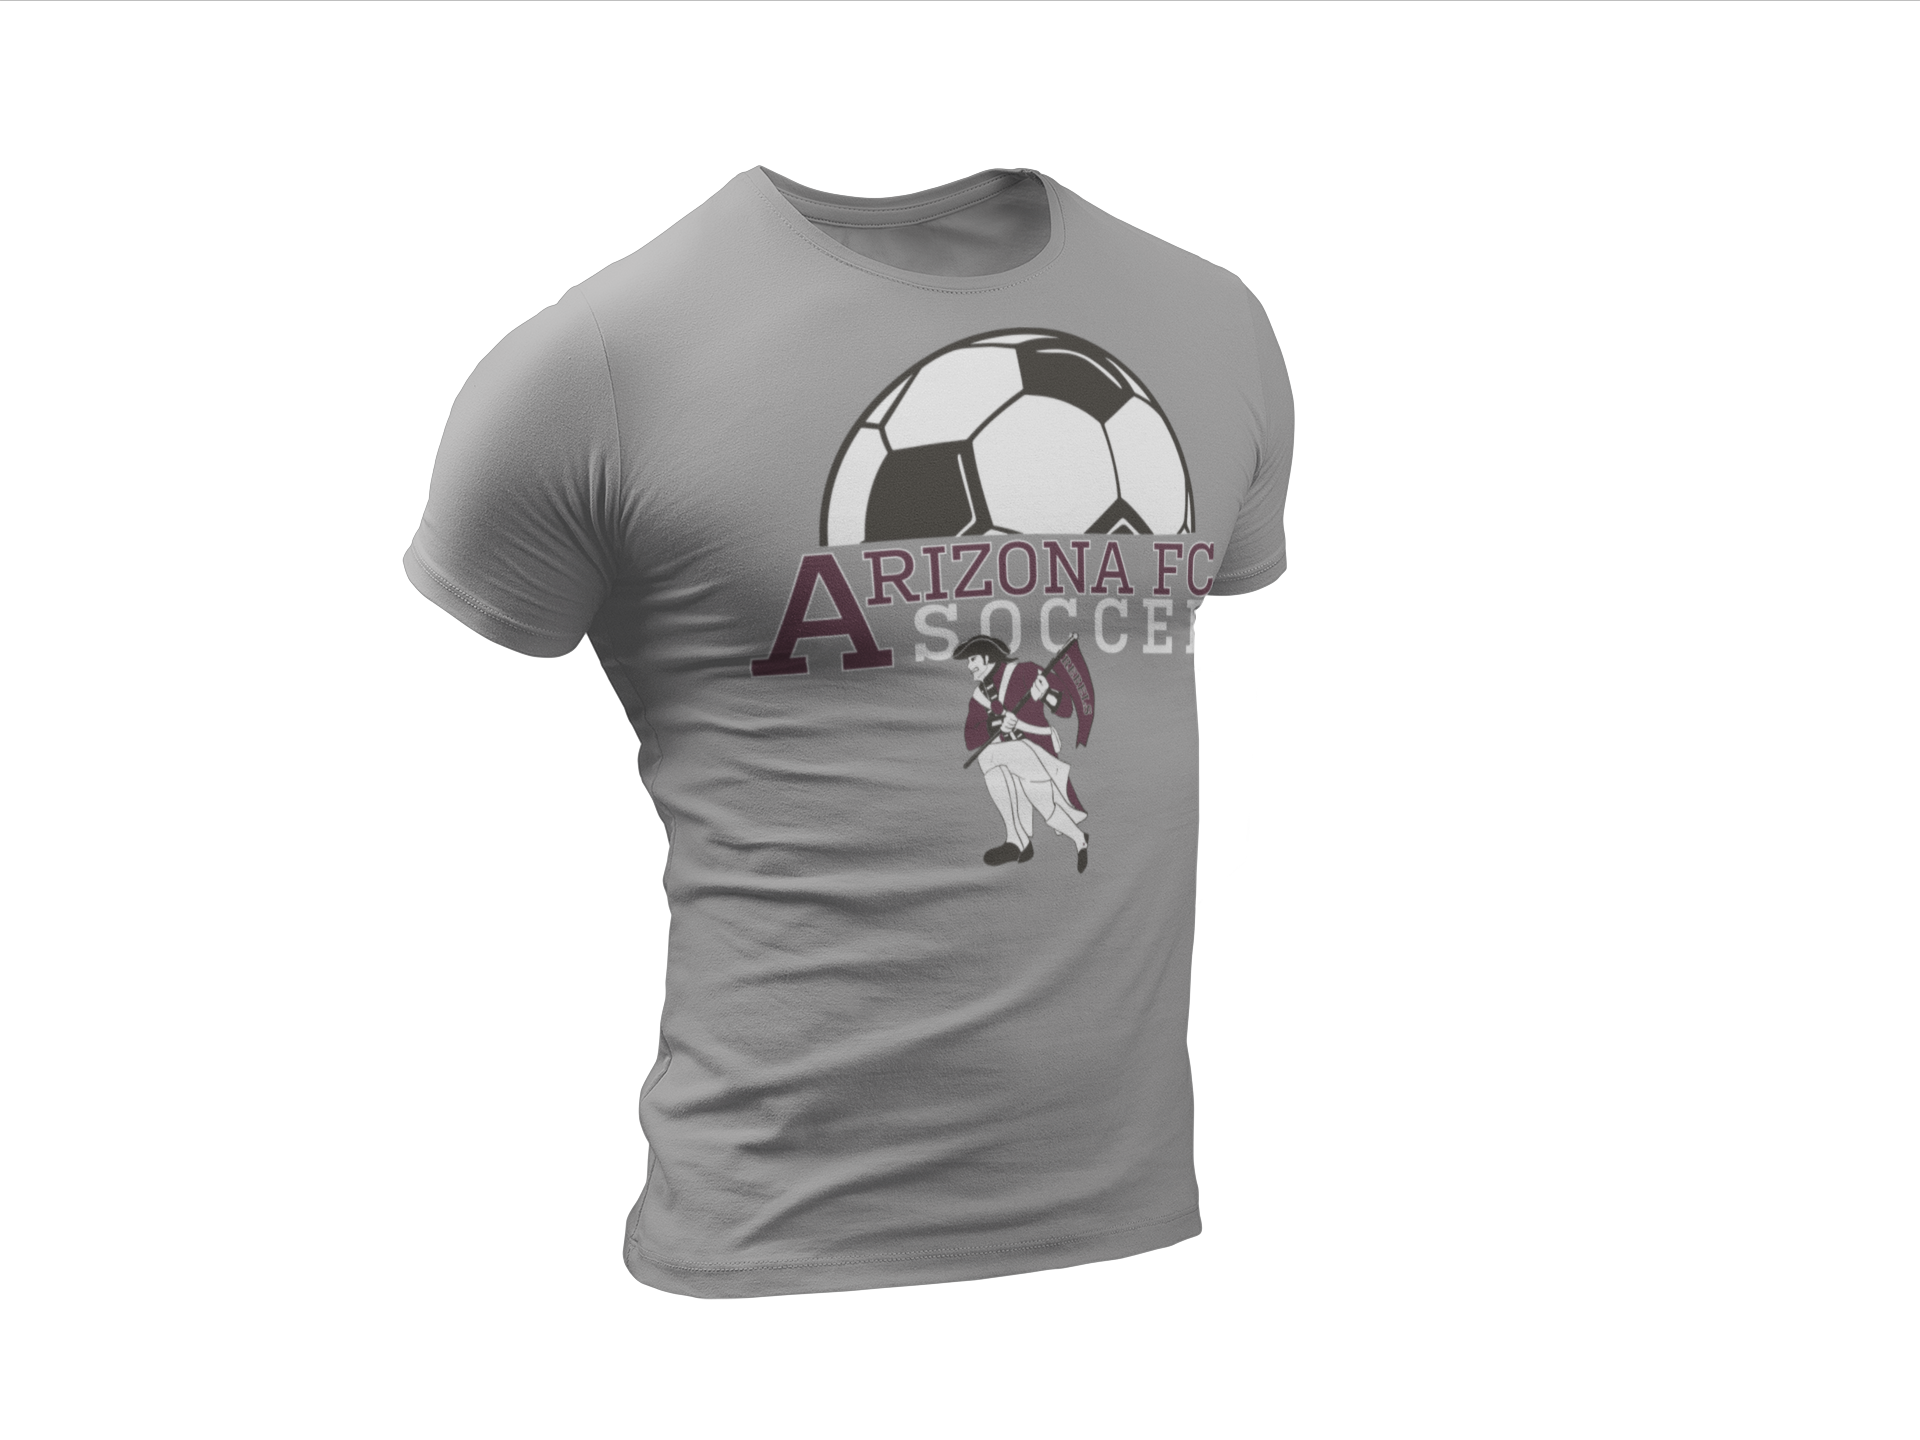 Arizona FC Soccer T-Shirt 00007